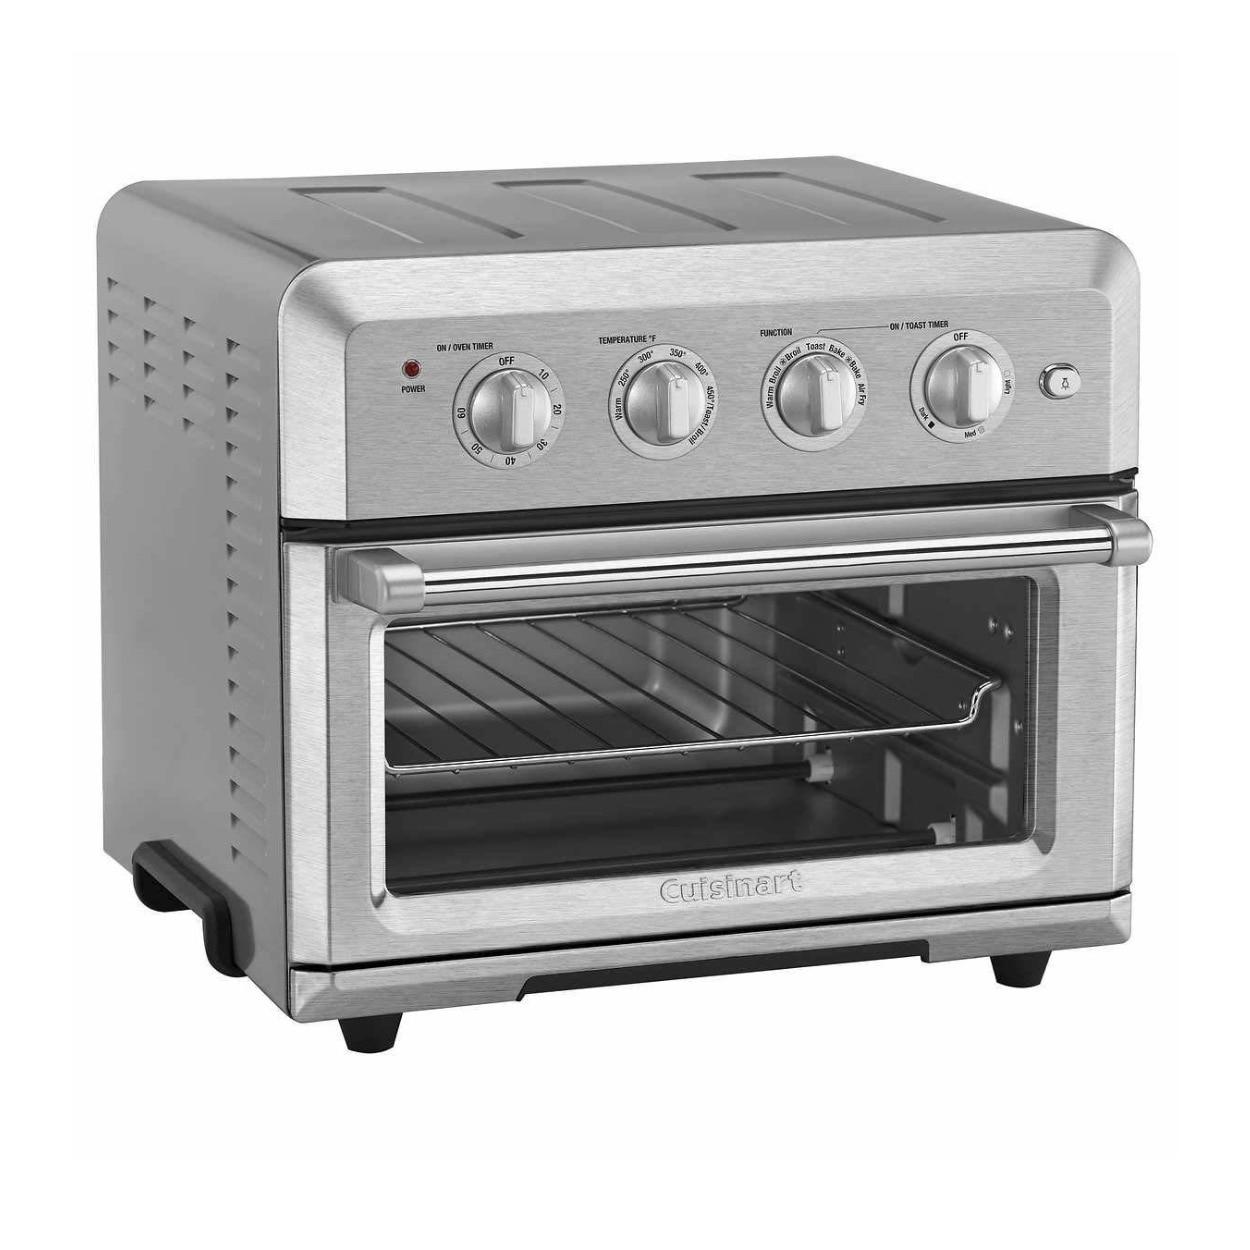 Shop Cuisinart Air Fryer Toaster Oven Silver Renewed